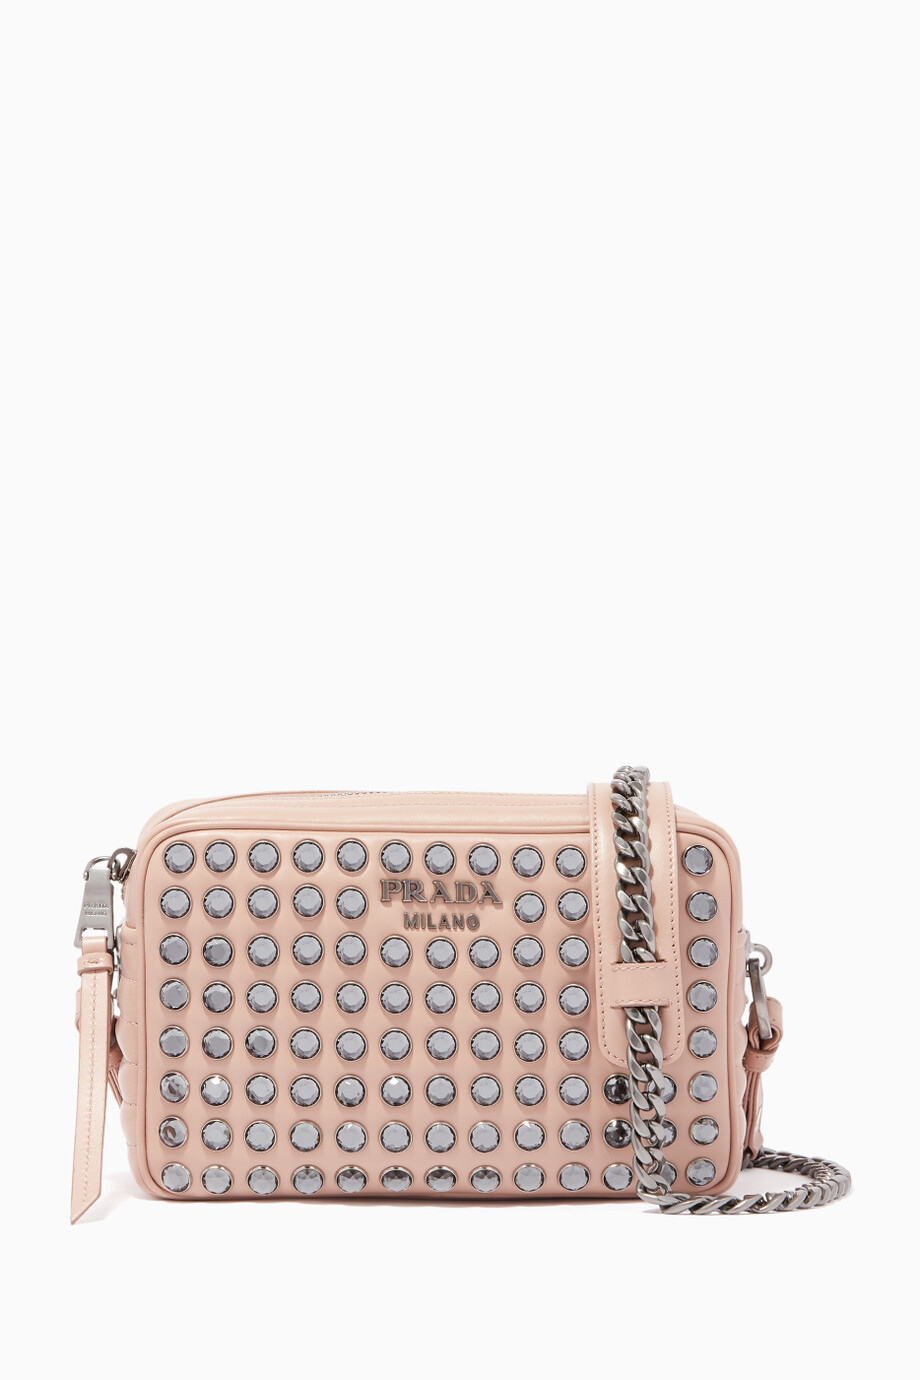 408ee2ea34cc Shop Prada Pink Light-Pink Diagramme Crystal Leather Cross-Body Bag ...